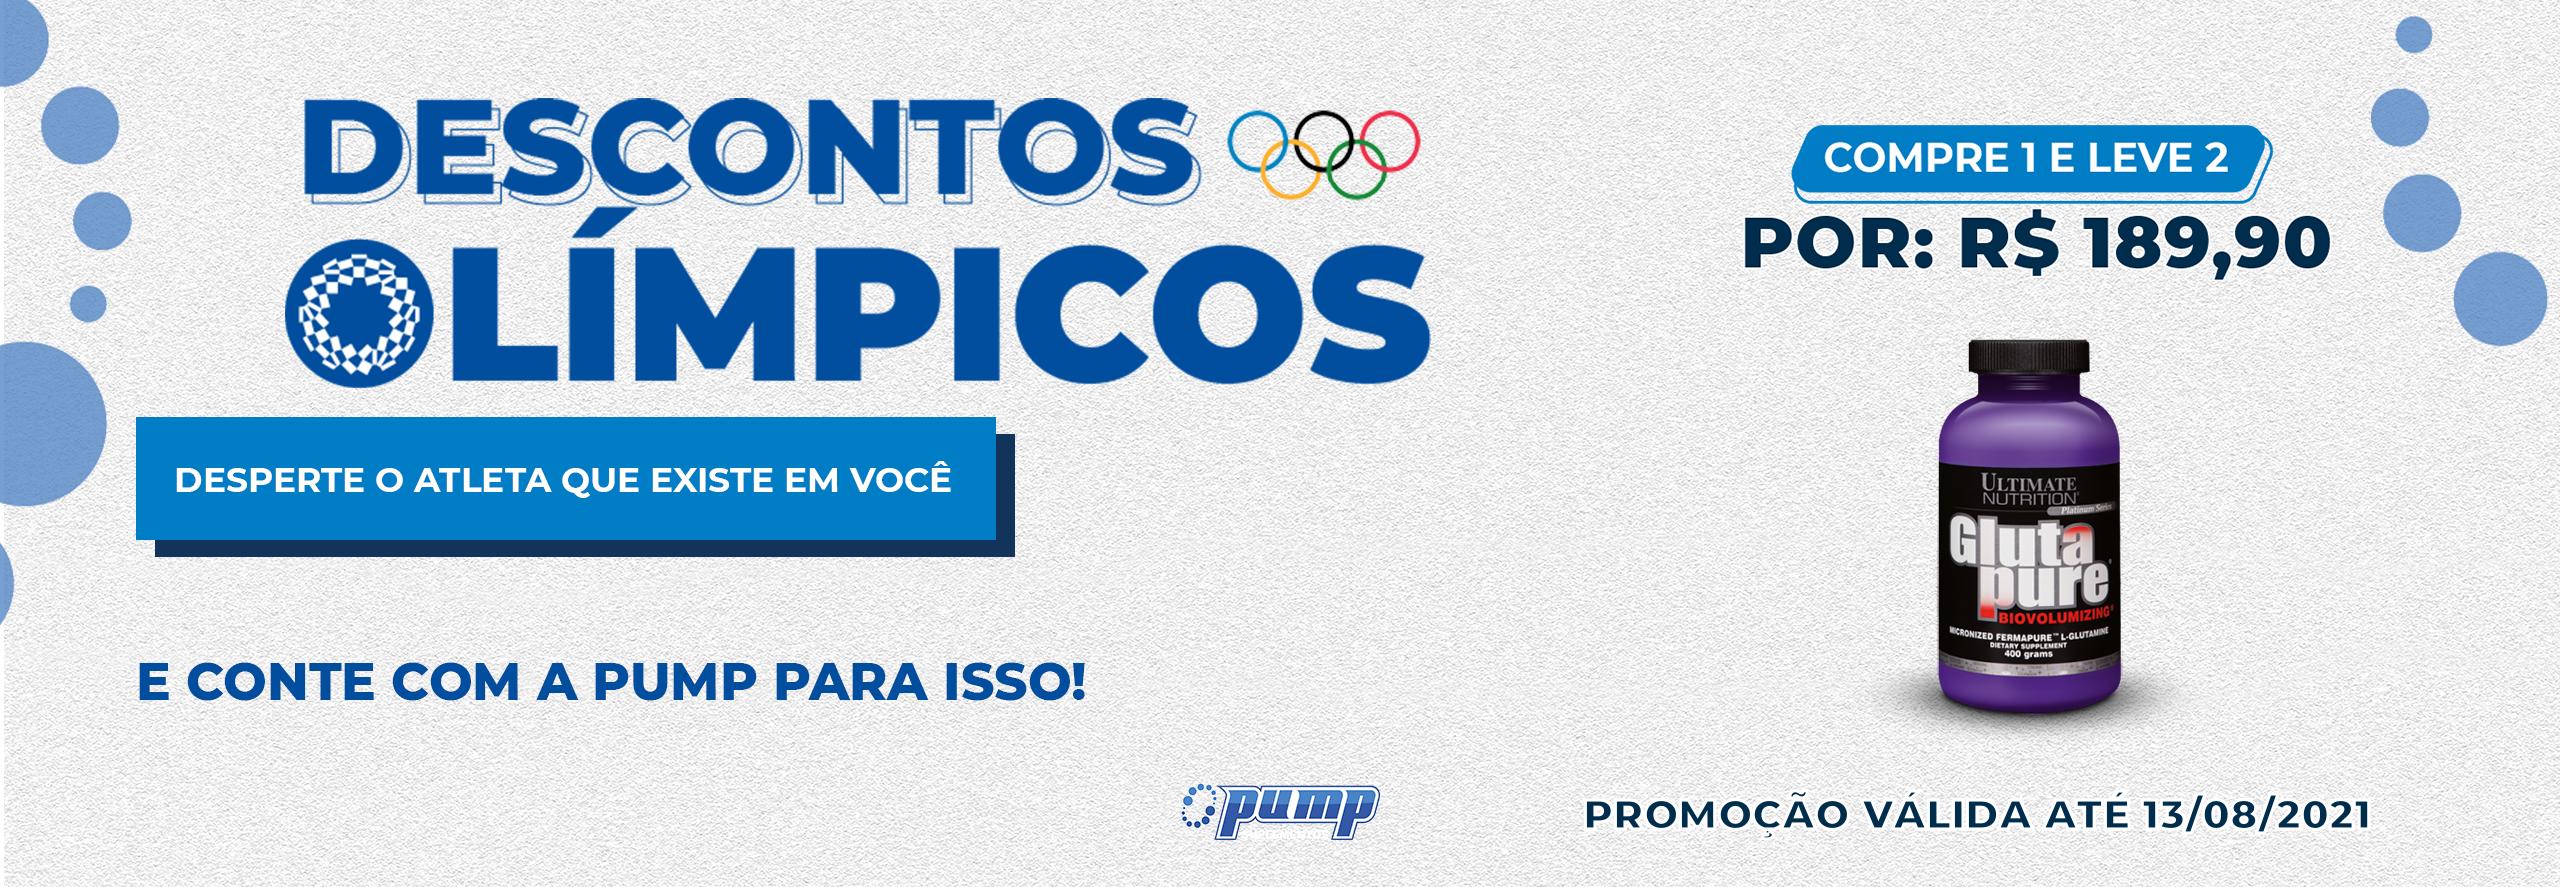 desconto olimpico 6